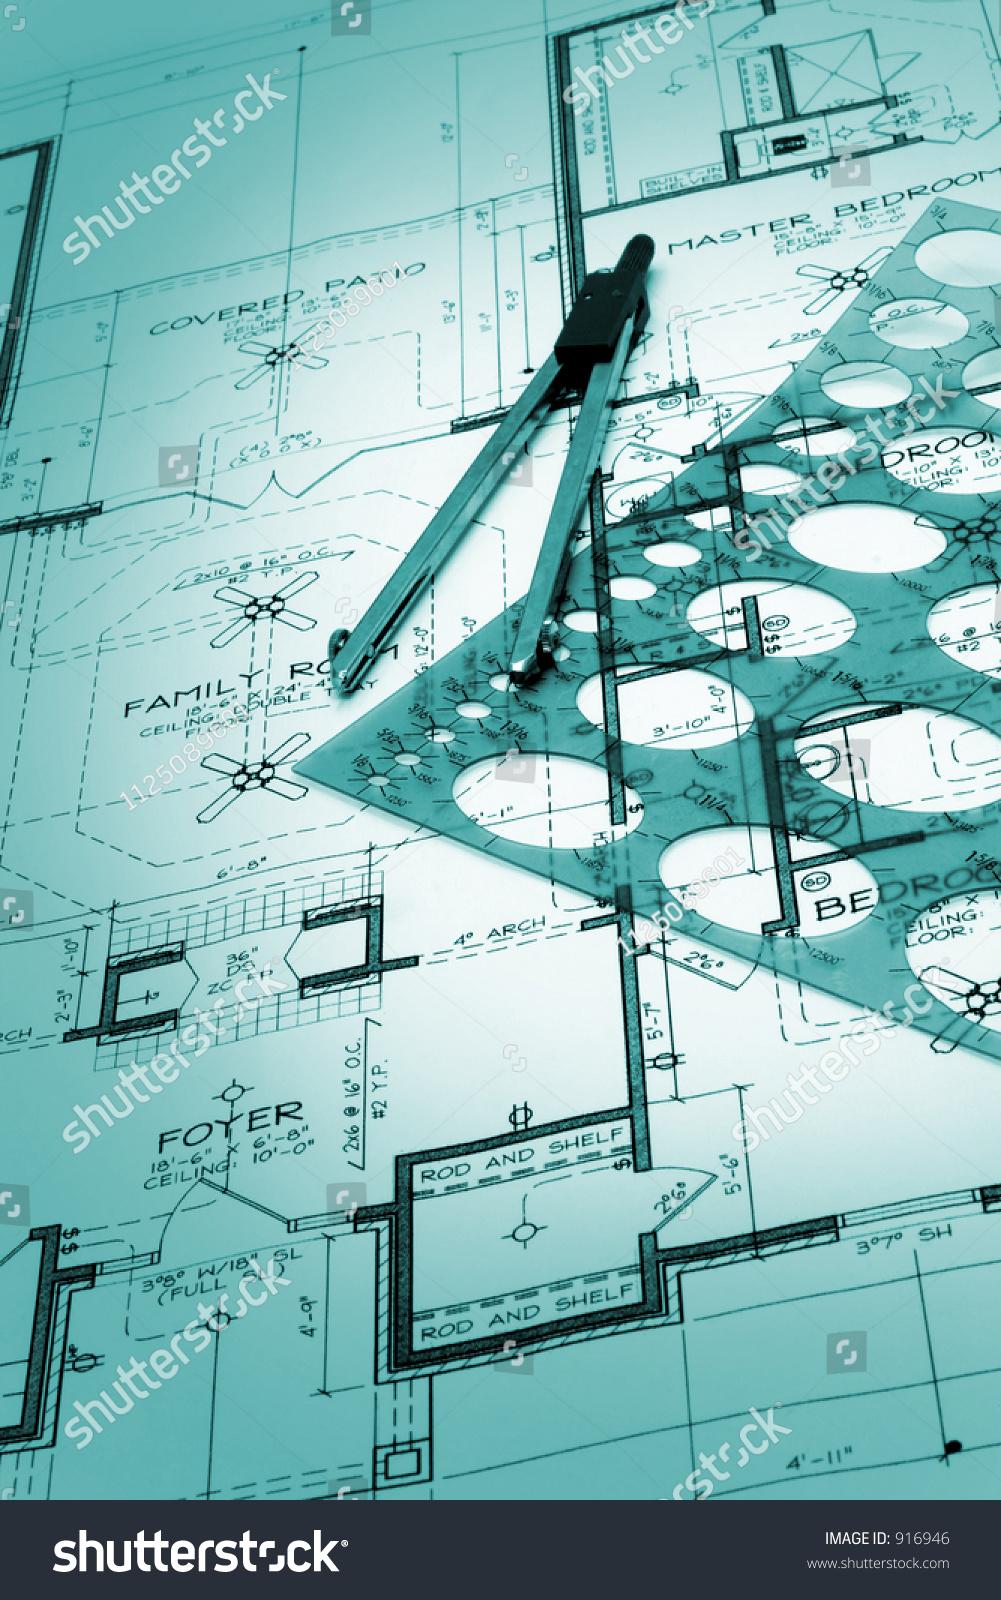 Blueprint house plans stock photo 916946 shutterstock malvernweather Images